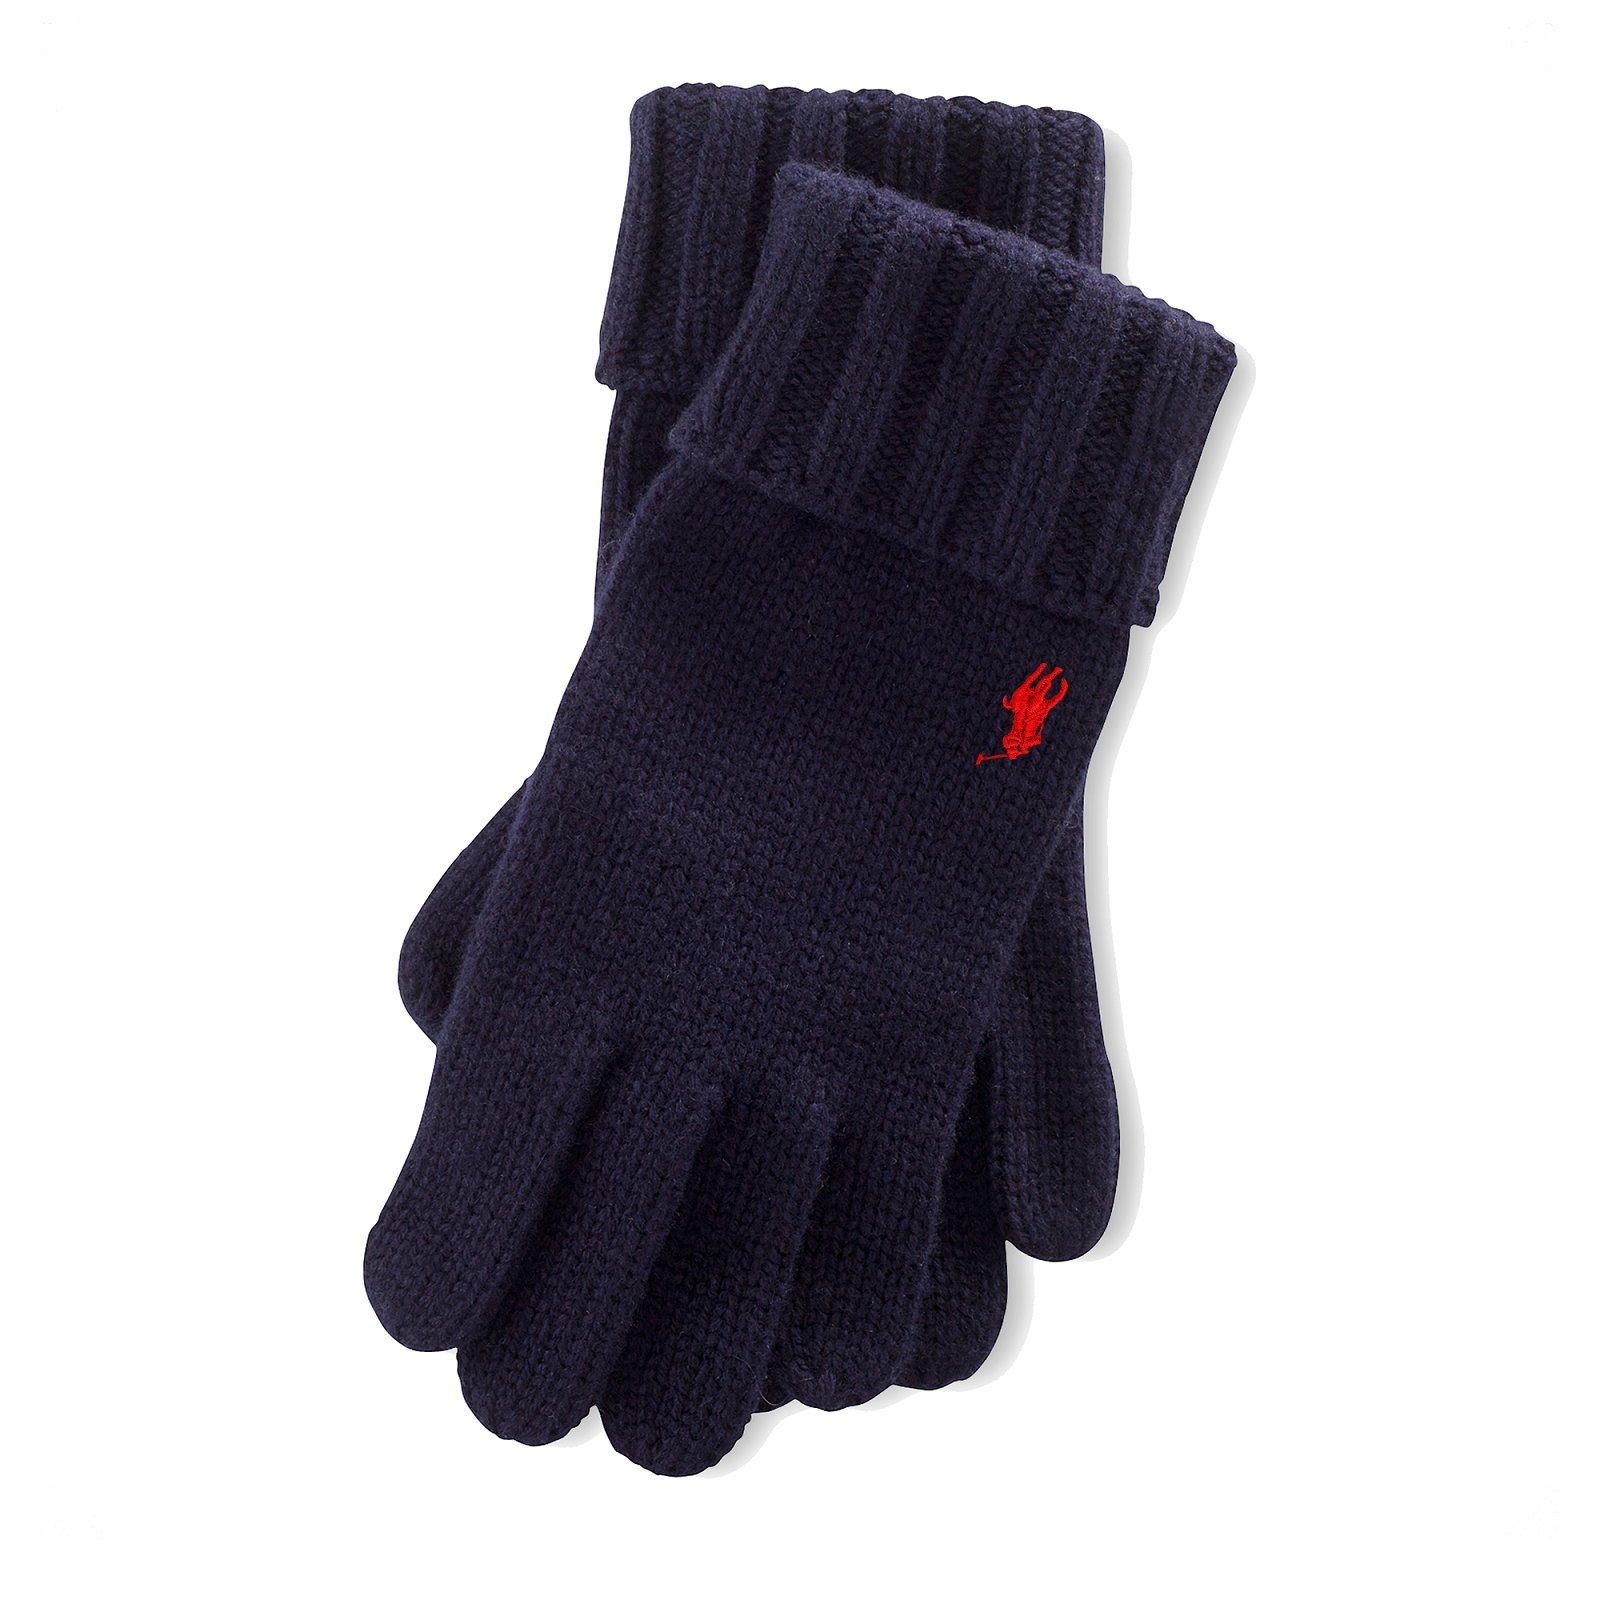 d8b78af5109 RALPH LAUREN gants en laine logo rouge - 710719818